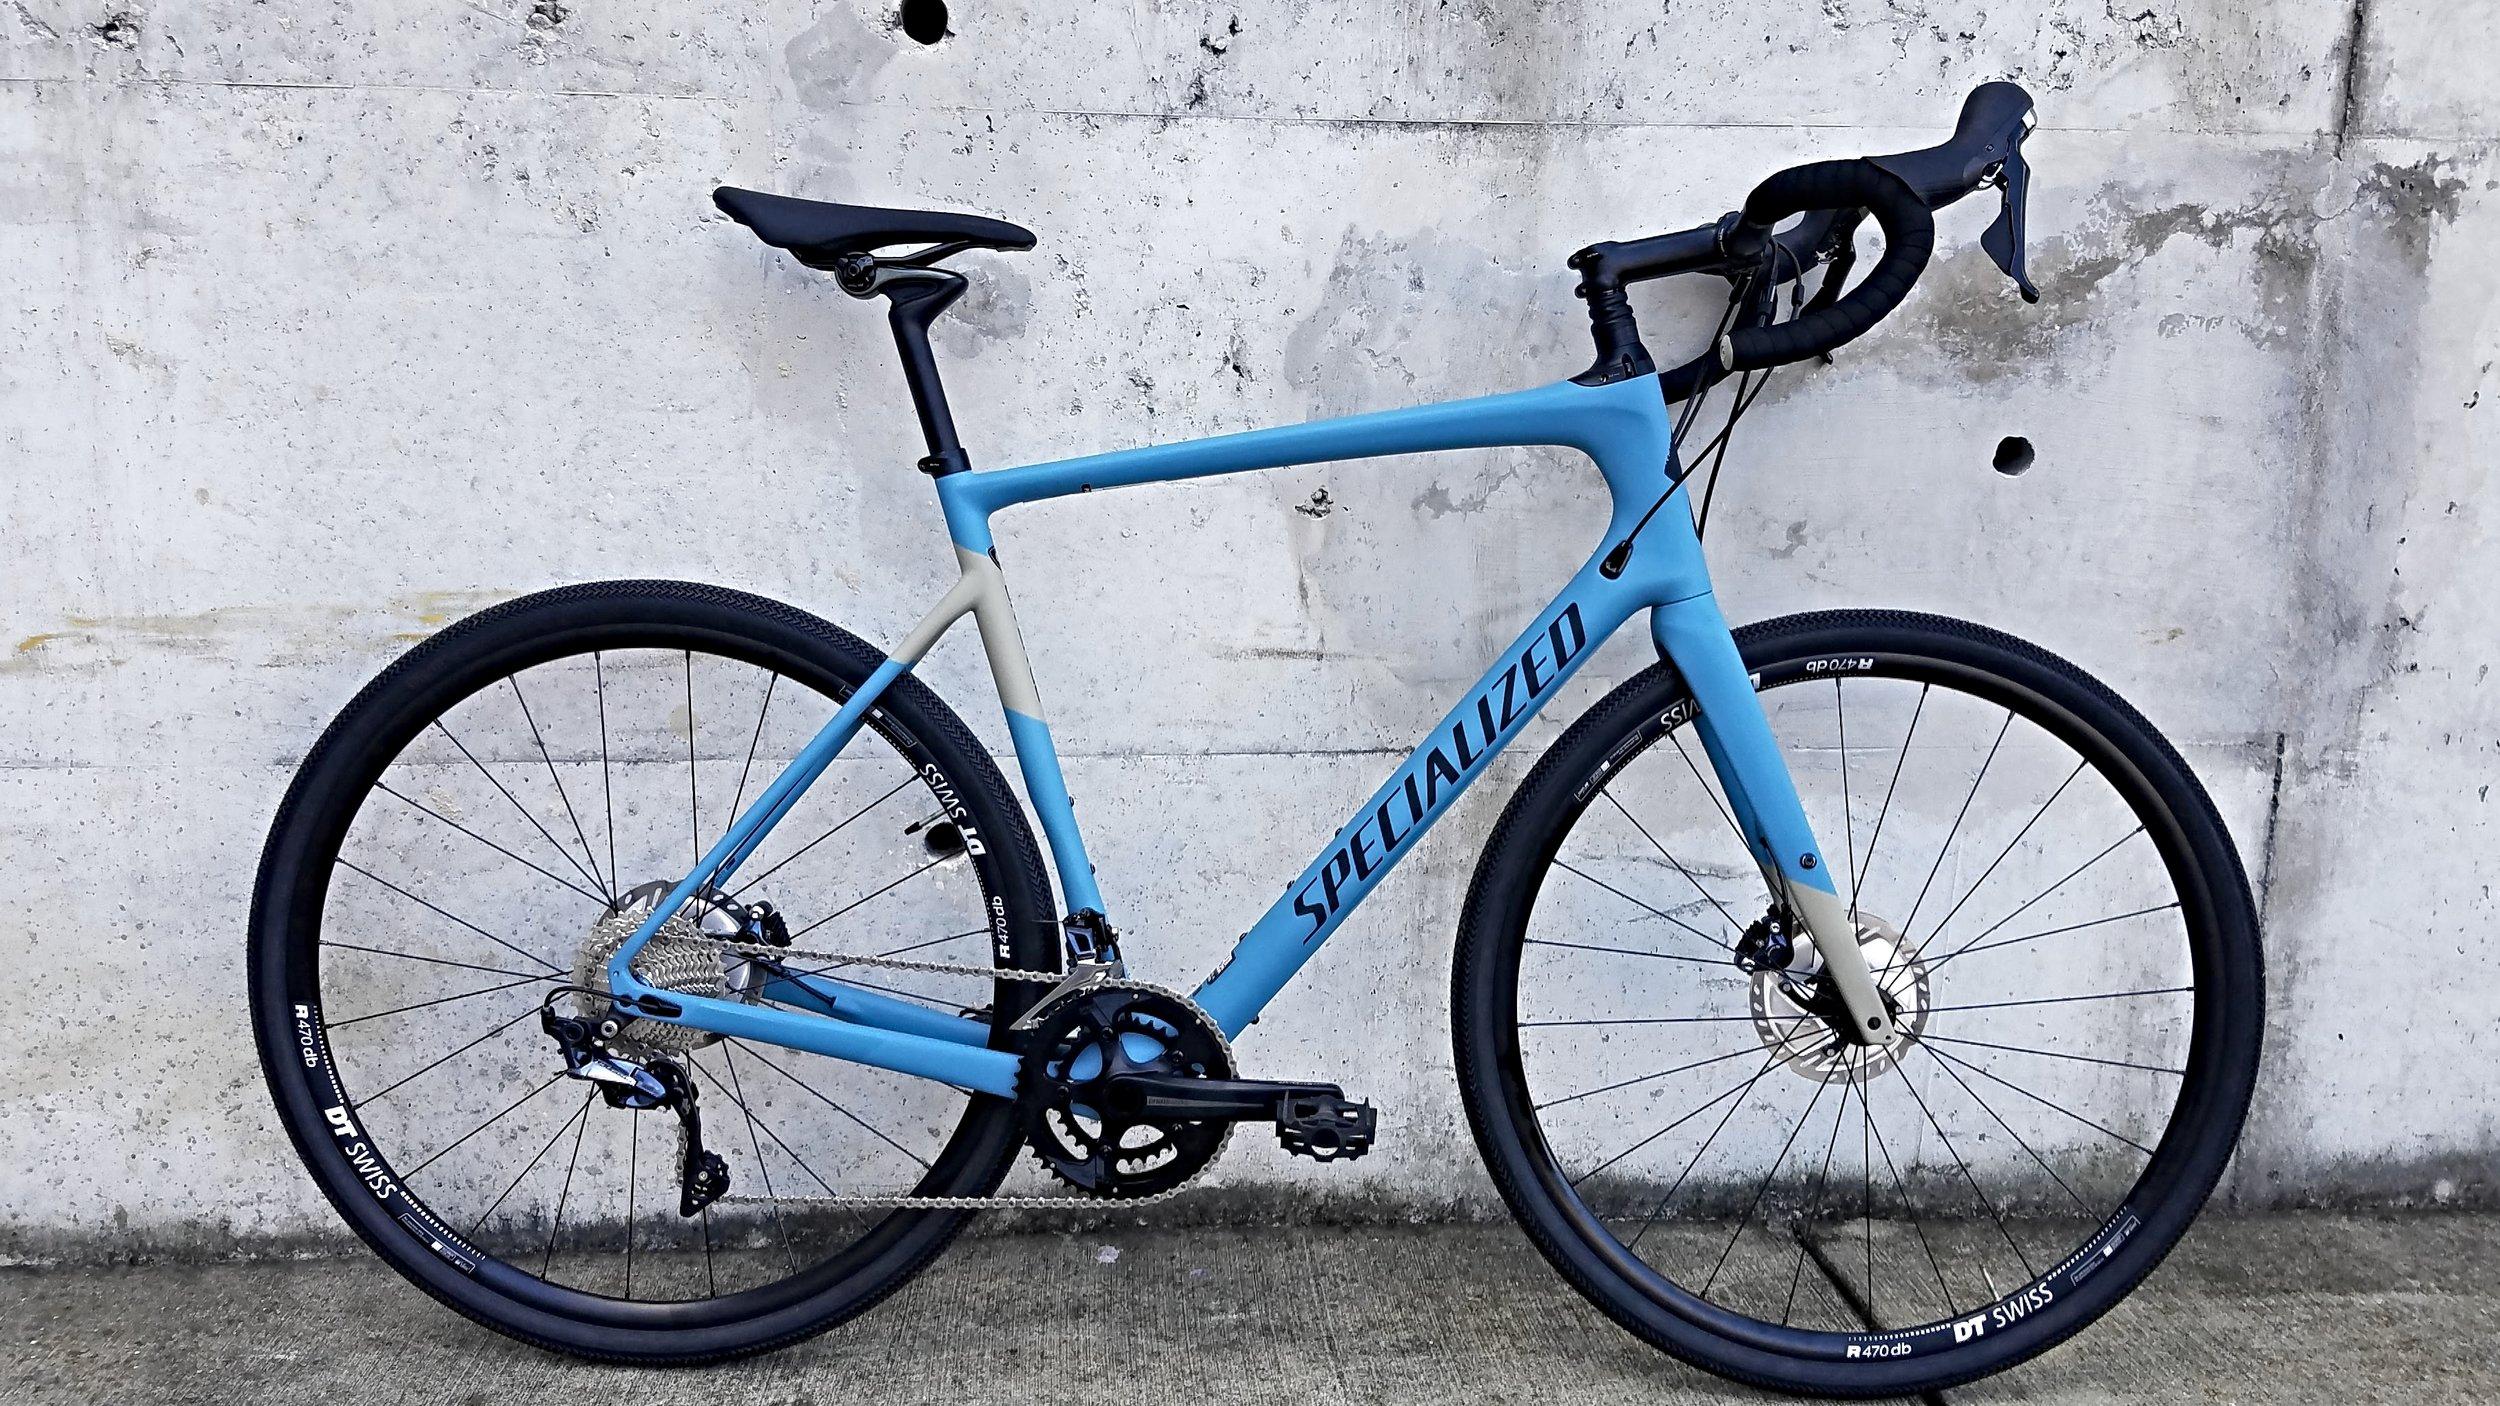 Bike pictured size: 64cm